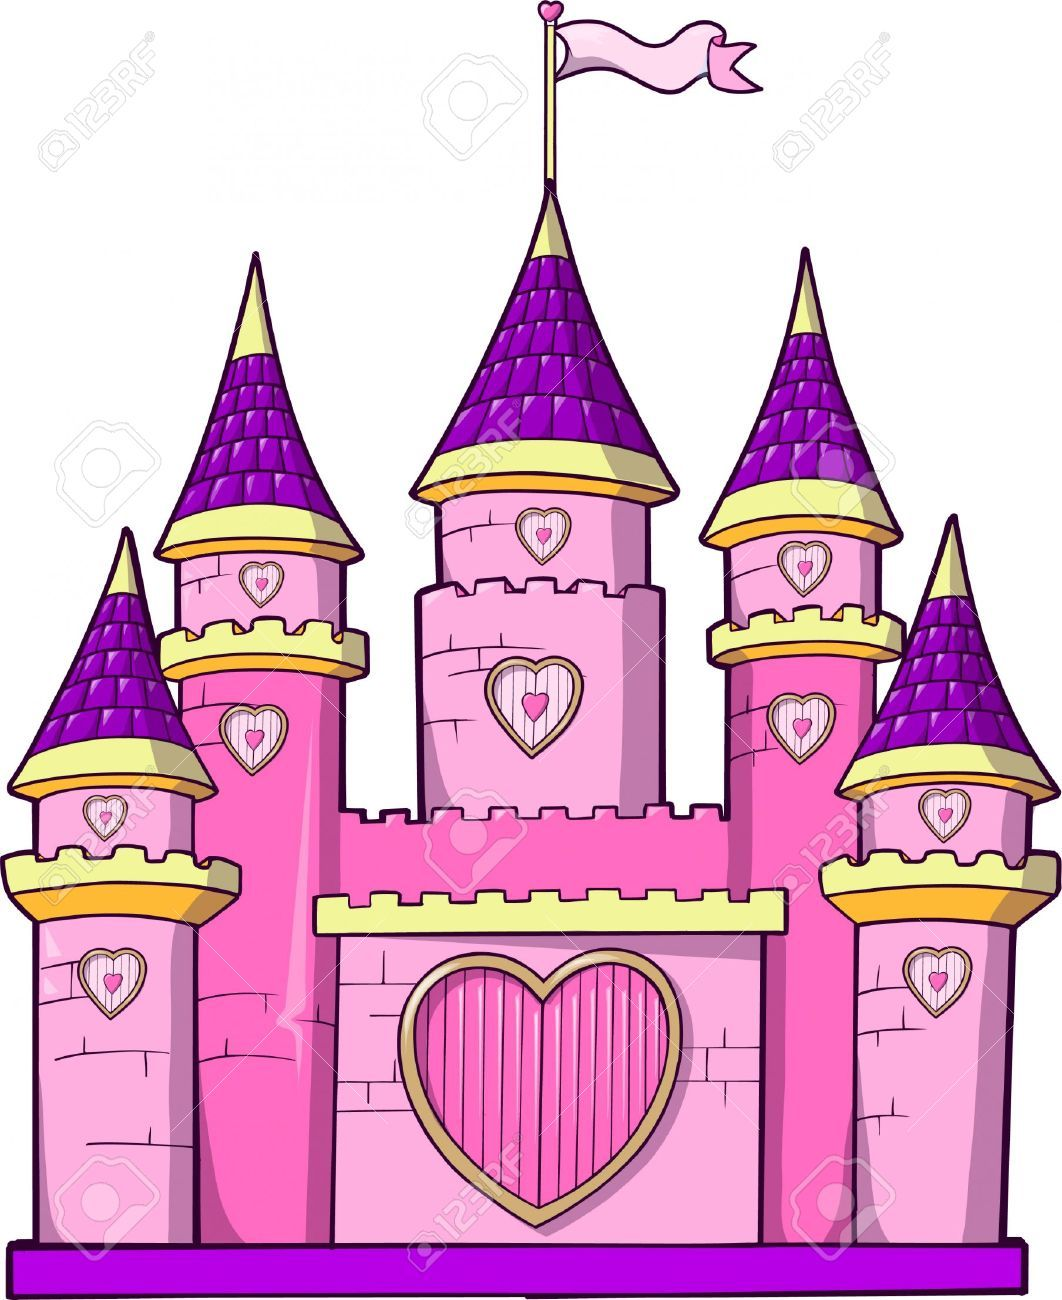 princess castle pictures Google Search Castle cartoon